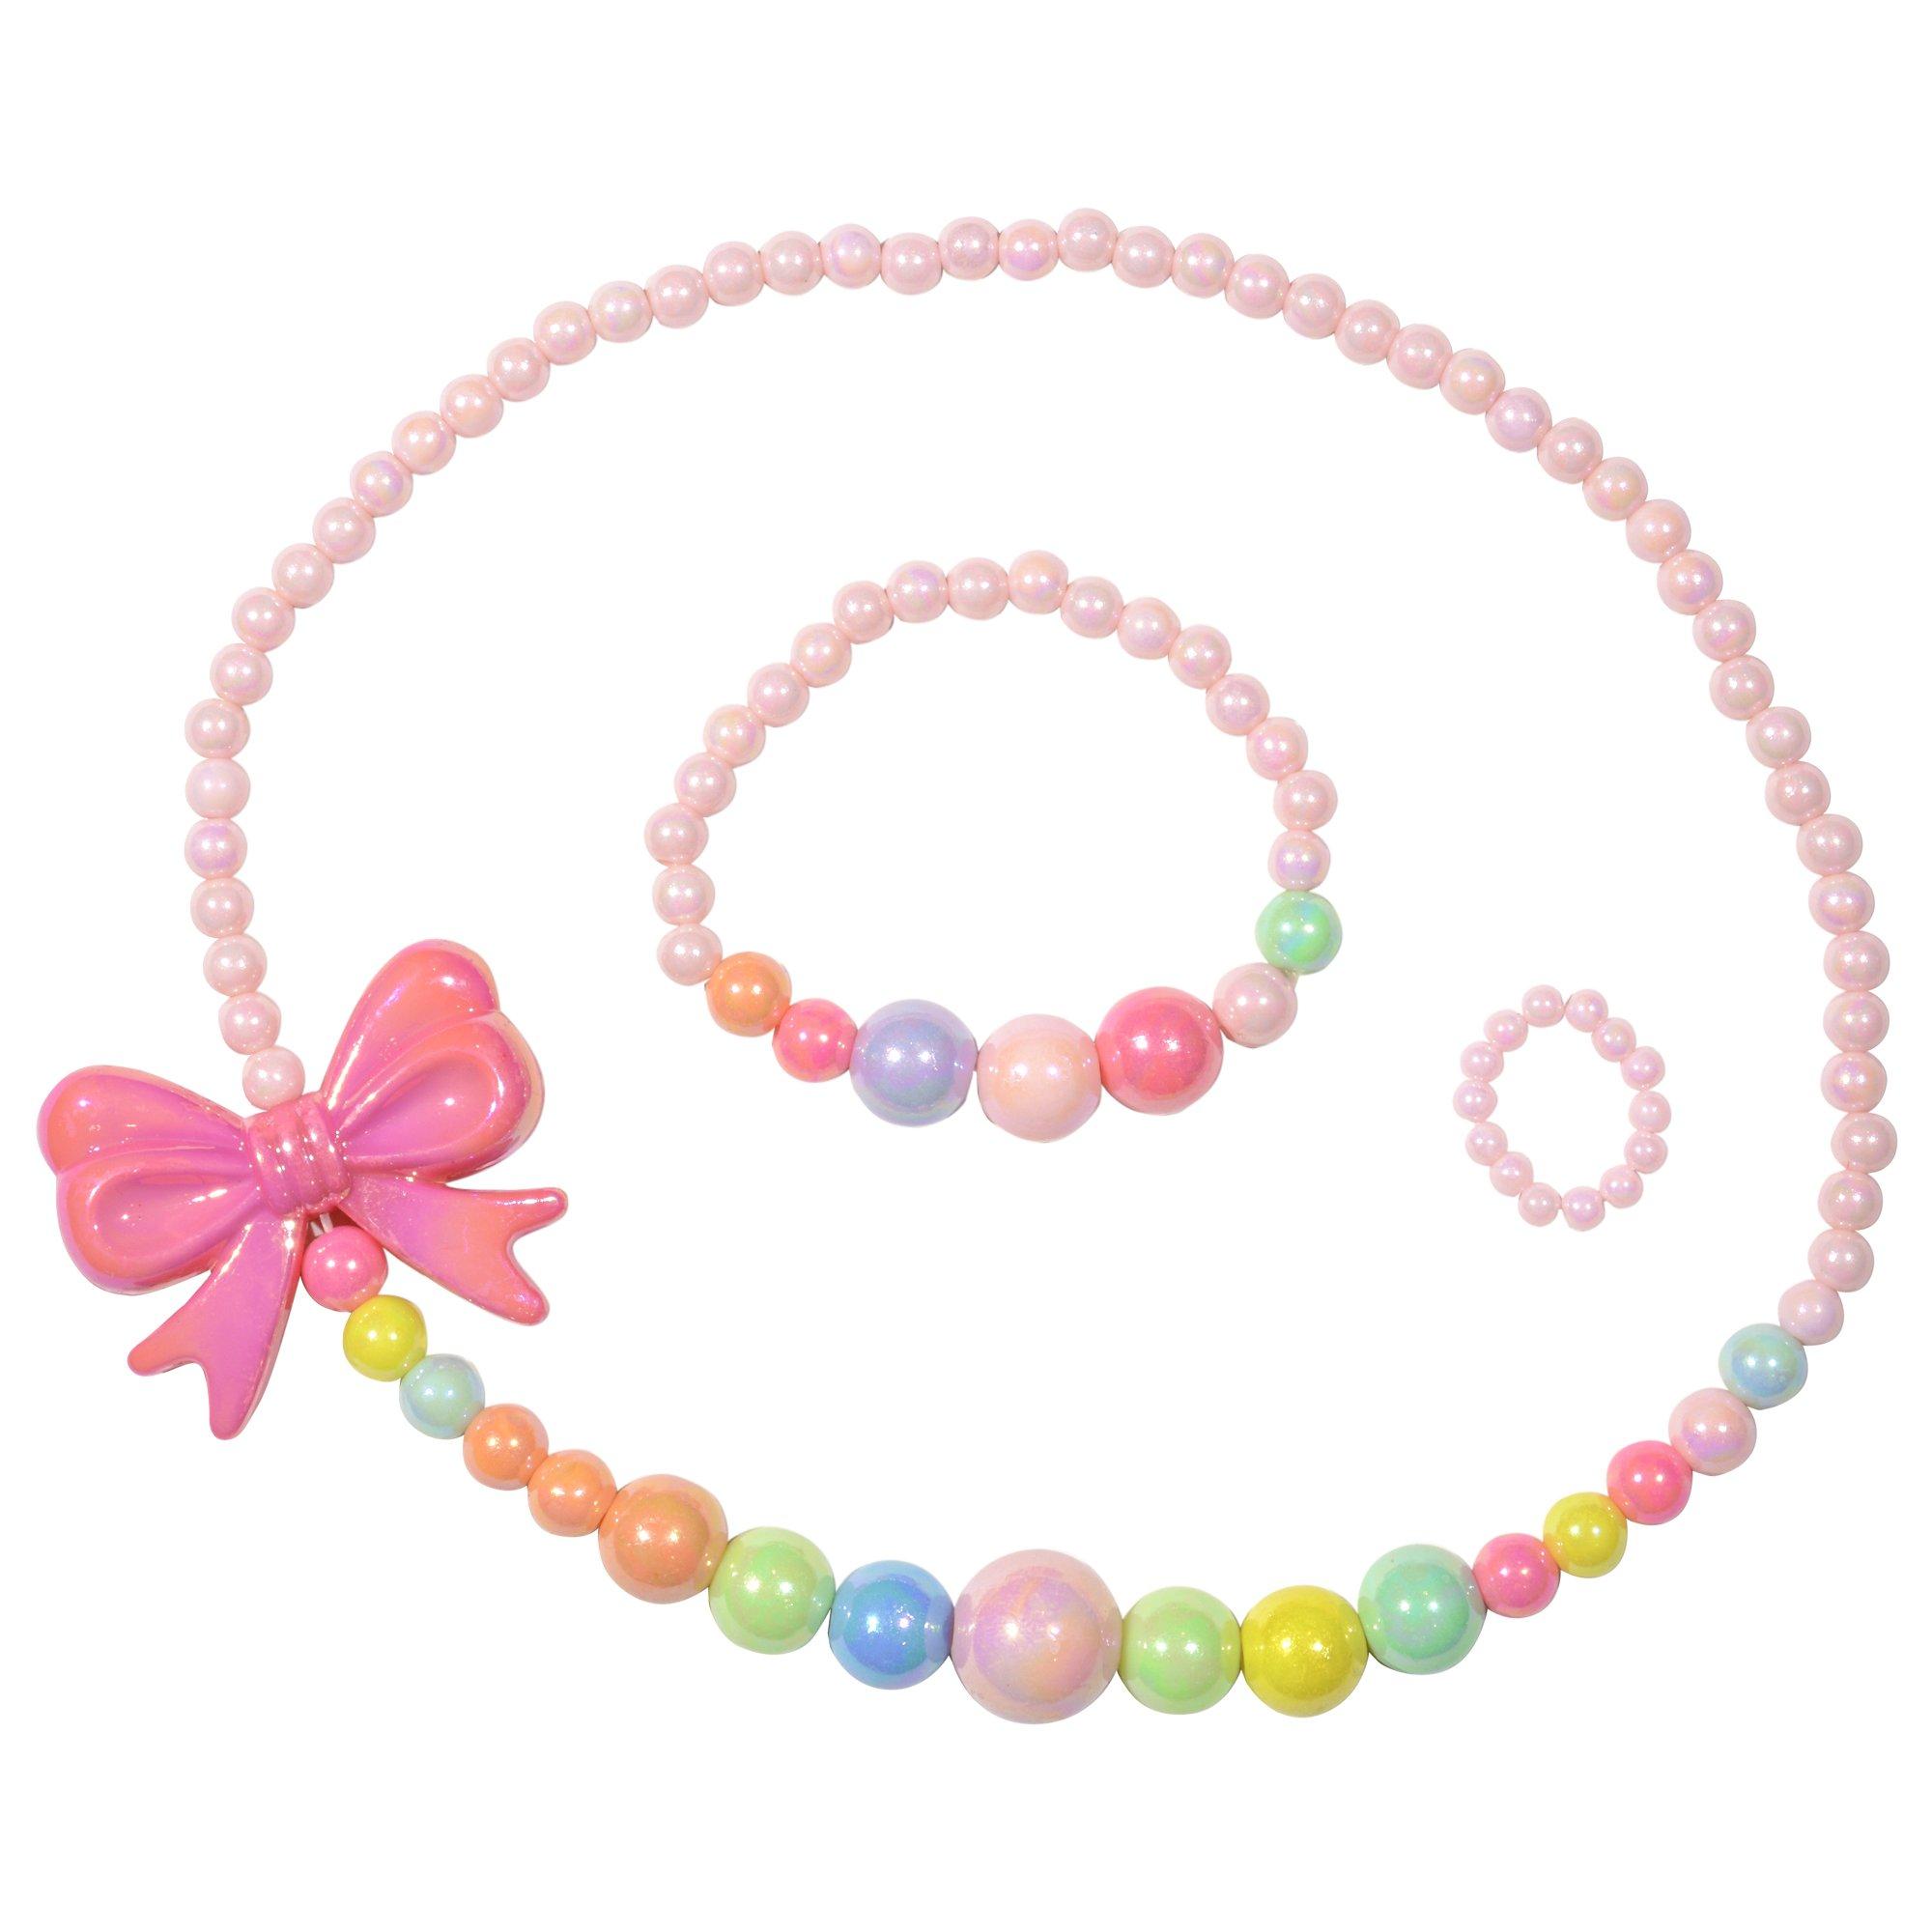 Amazon.com: SMITCO Kids Jewelry - for Little Girls and ...